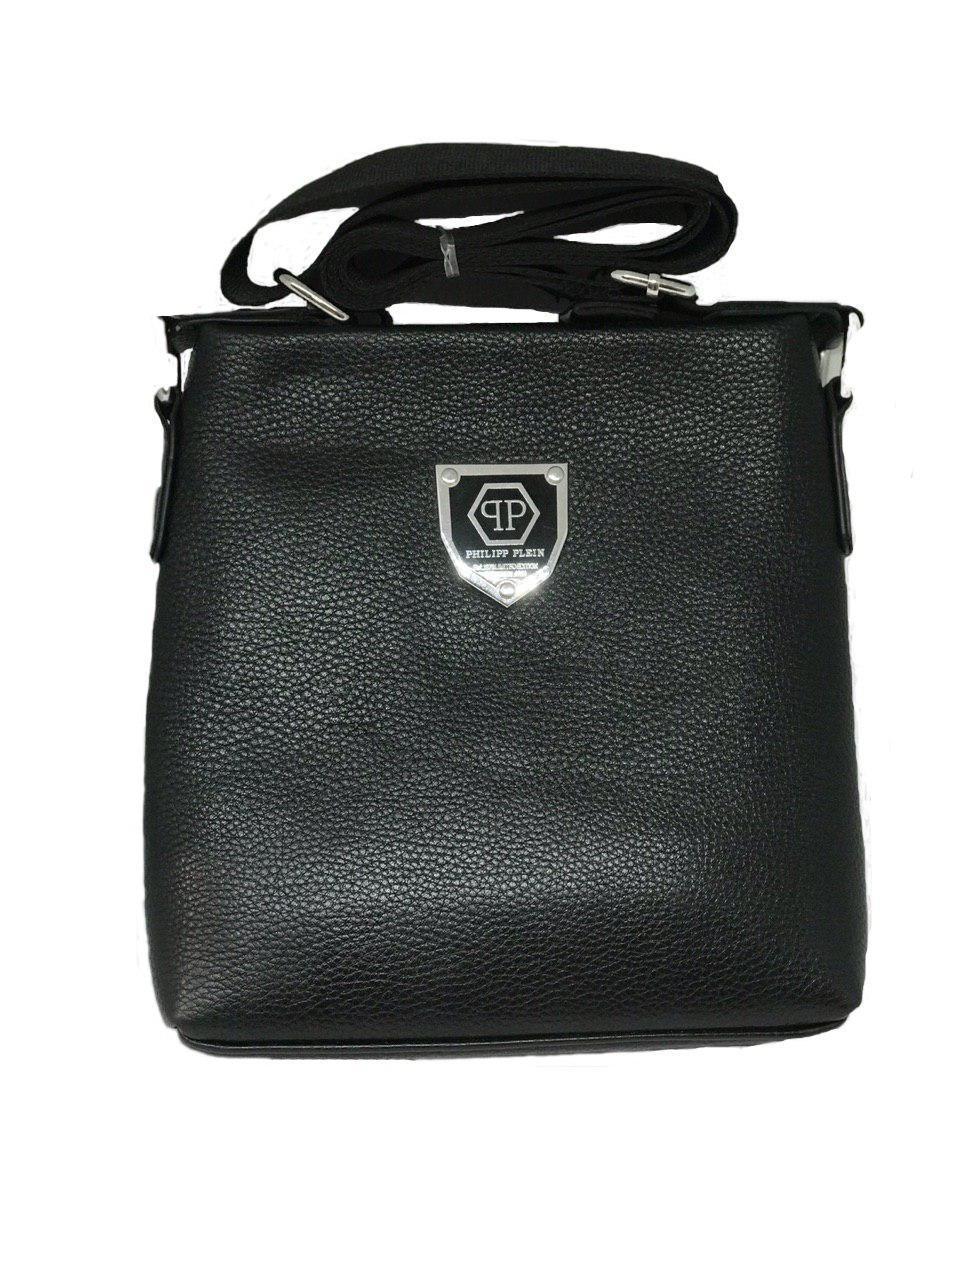 Мужская сумка через плечо Philipp Plein черная